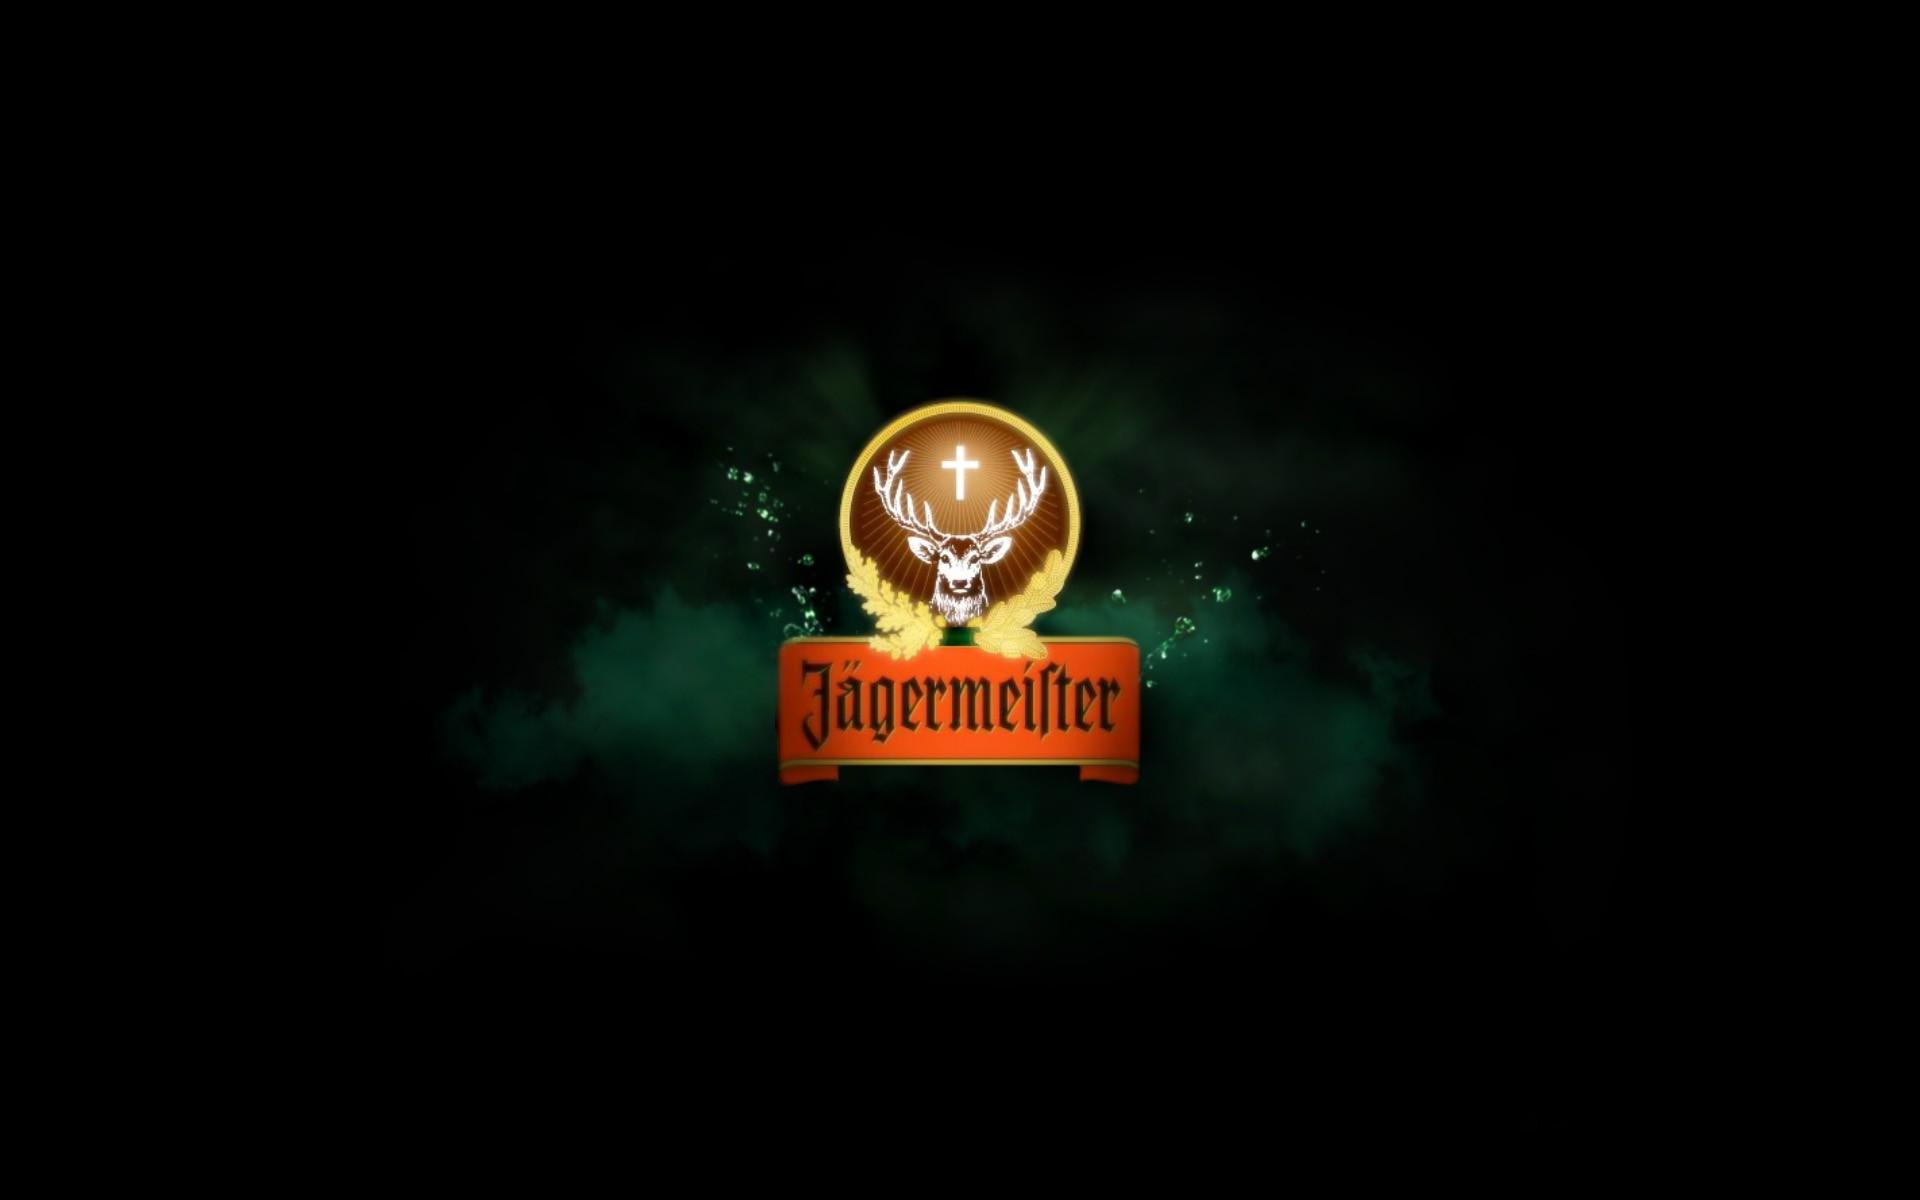 jagermeister wallpaper desktop - photo #3